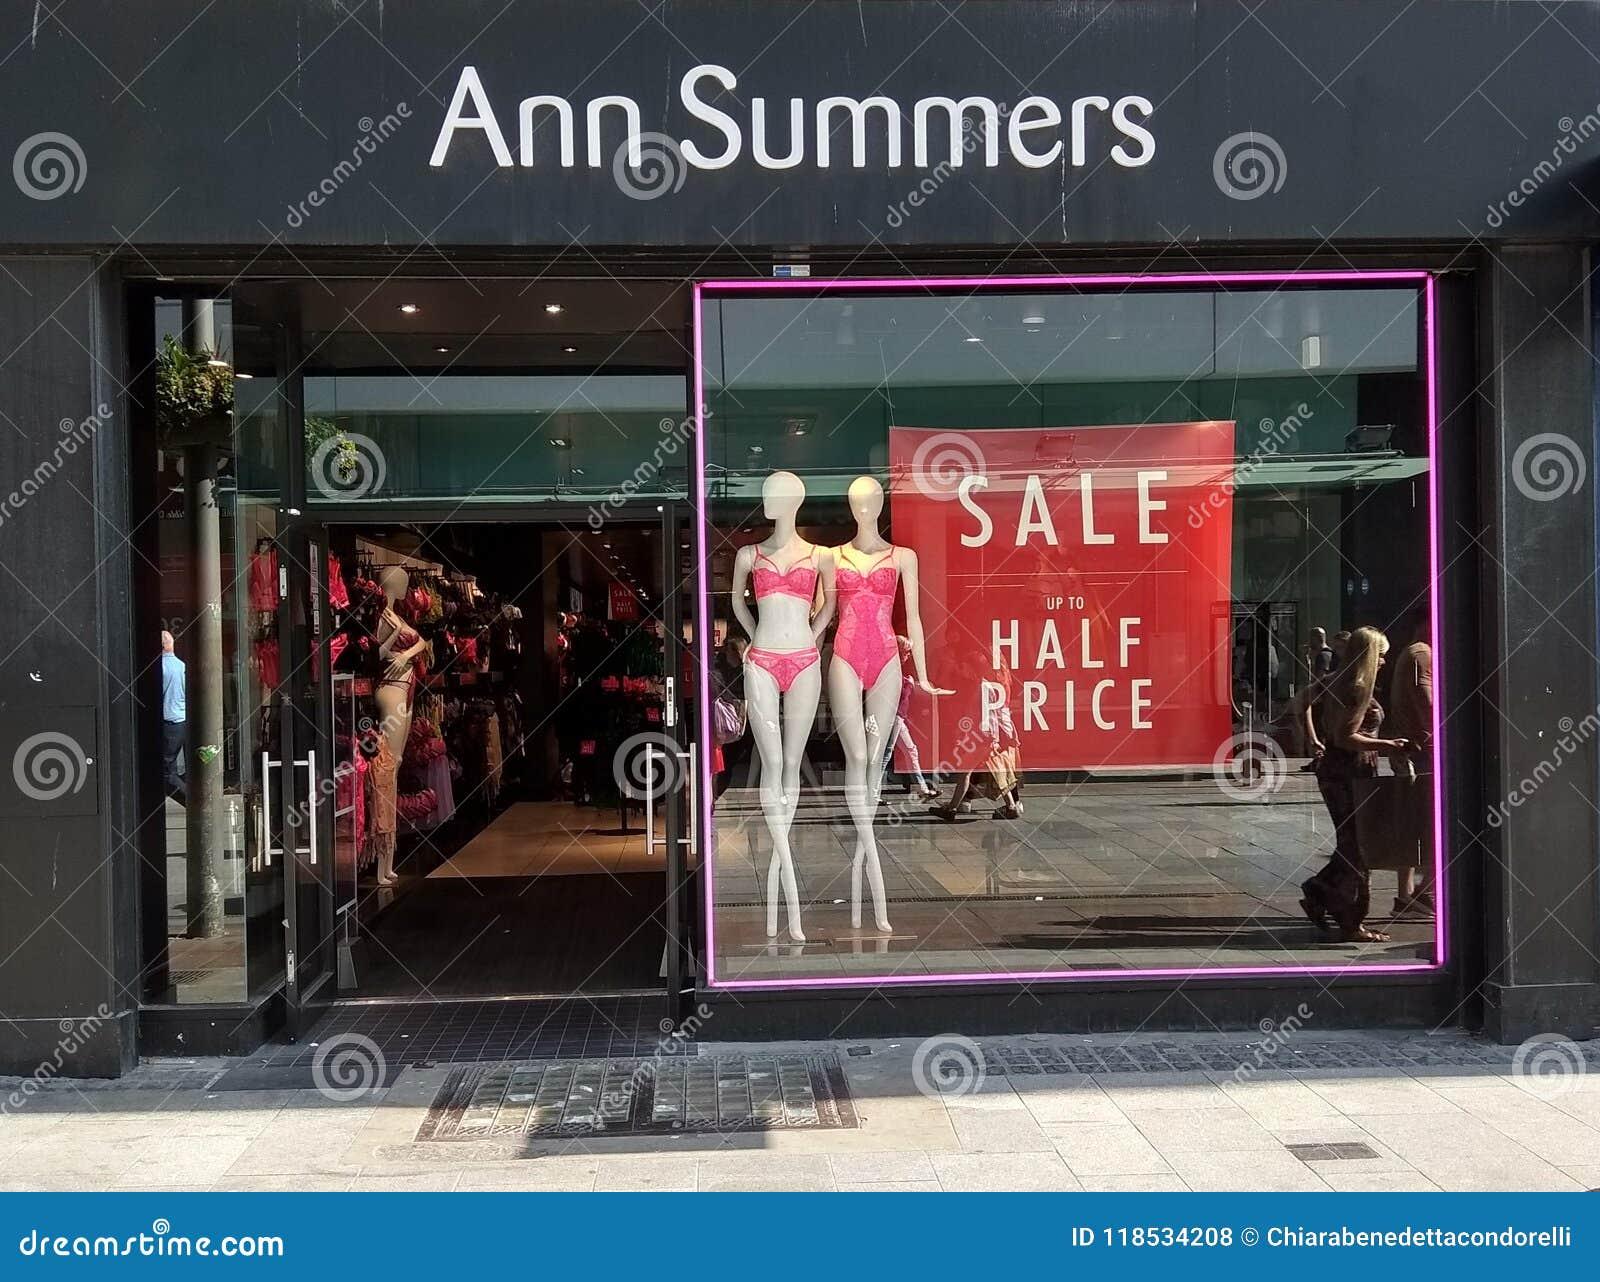 surf reacción Borradura  Ann Summers Dublin Henry Street Editorial Stock Photo - Image of adult,  erotism: 118534208